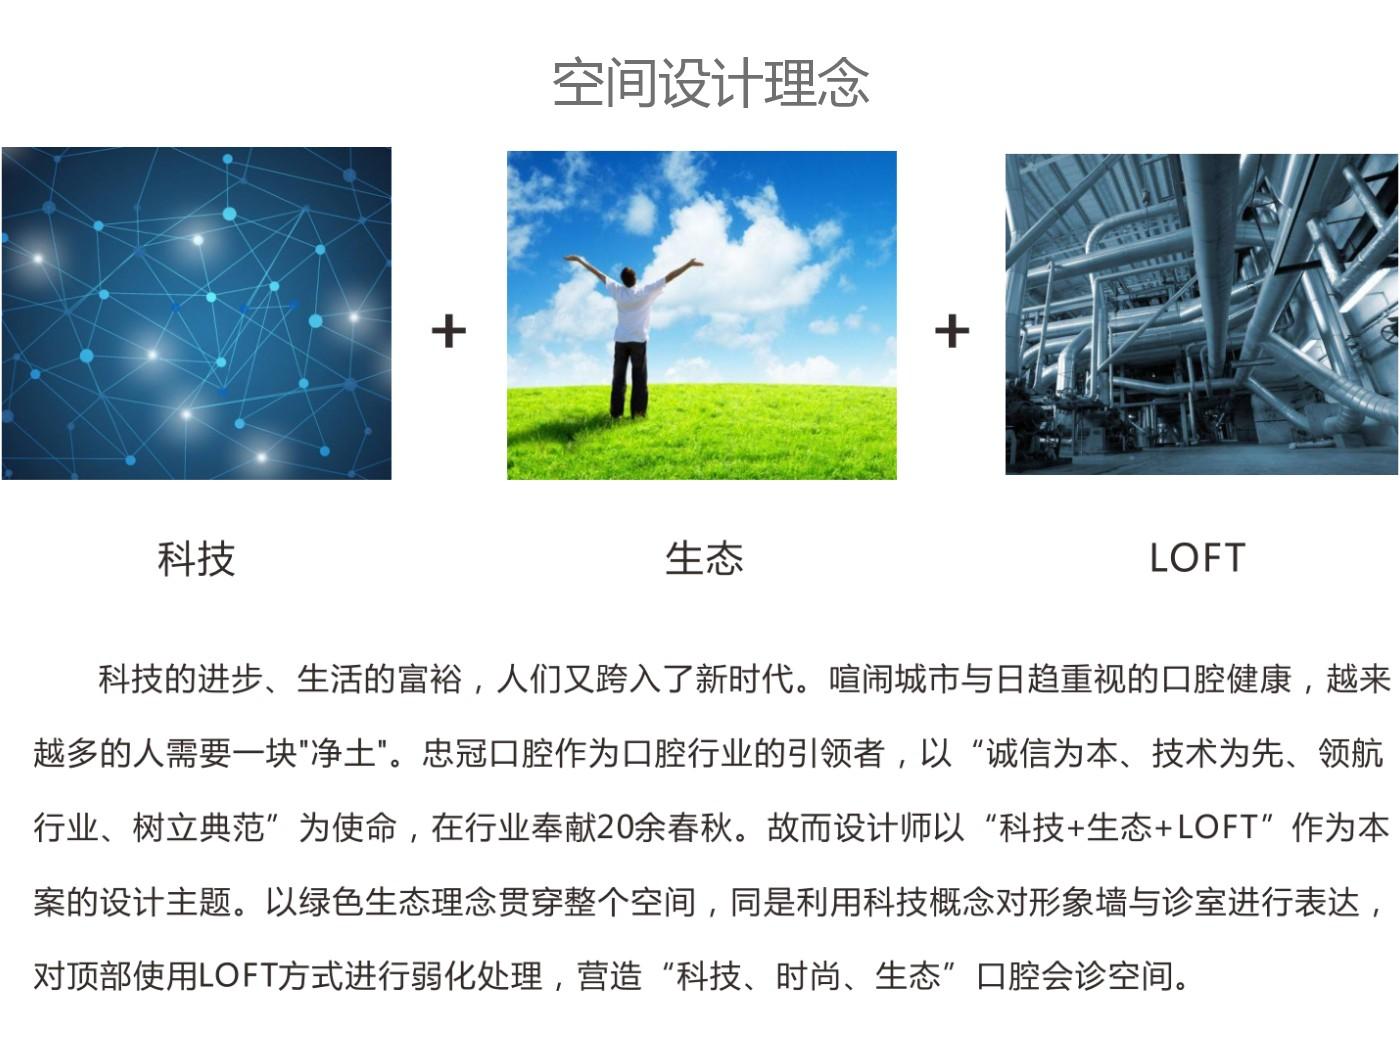 忠冠口腔<a href='http://www.6bubu.com/service/kongjiansheji/' title='' style='color:;font-weight:bold'>空間設計</a>理念.jpg